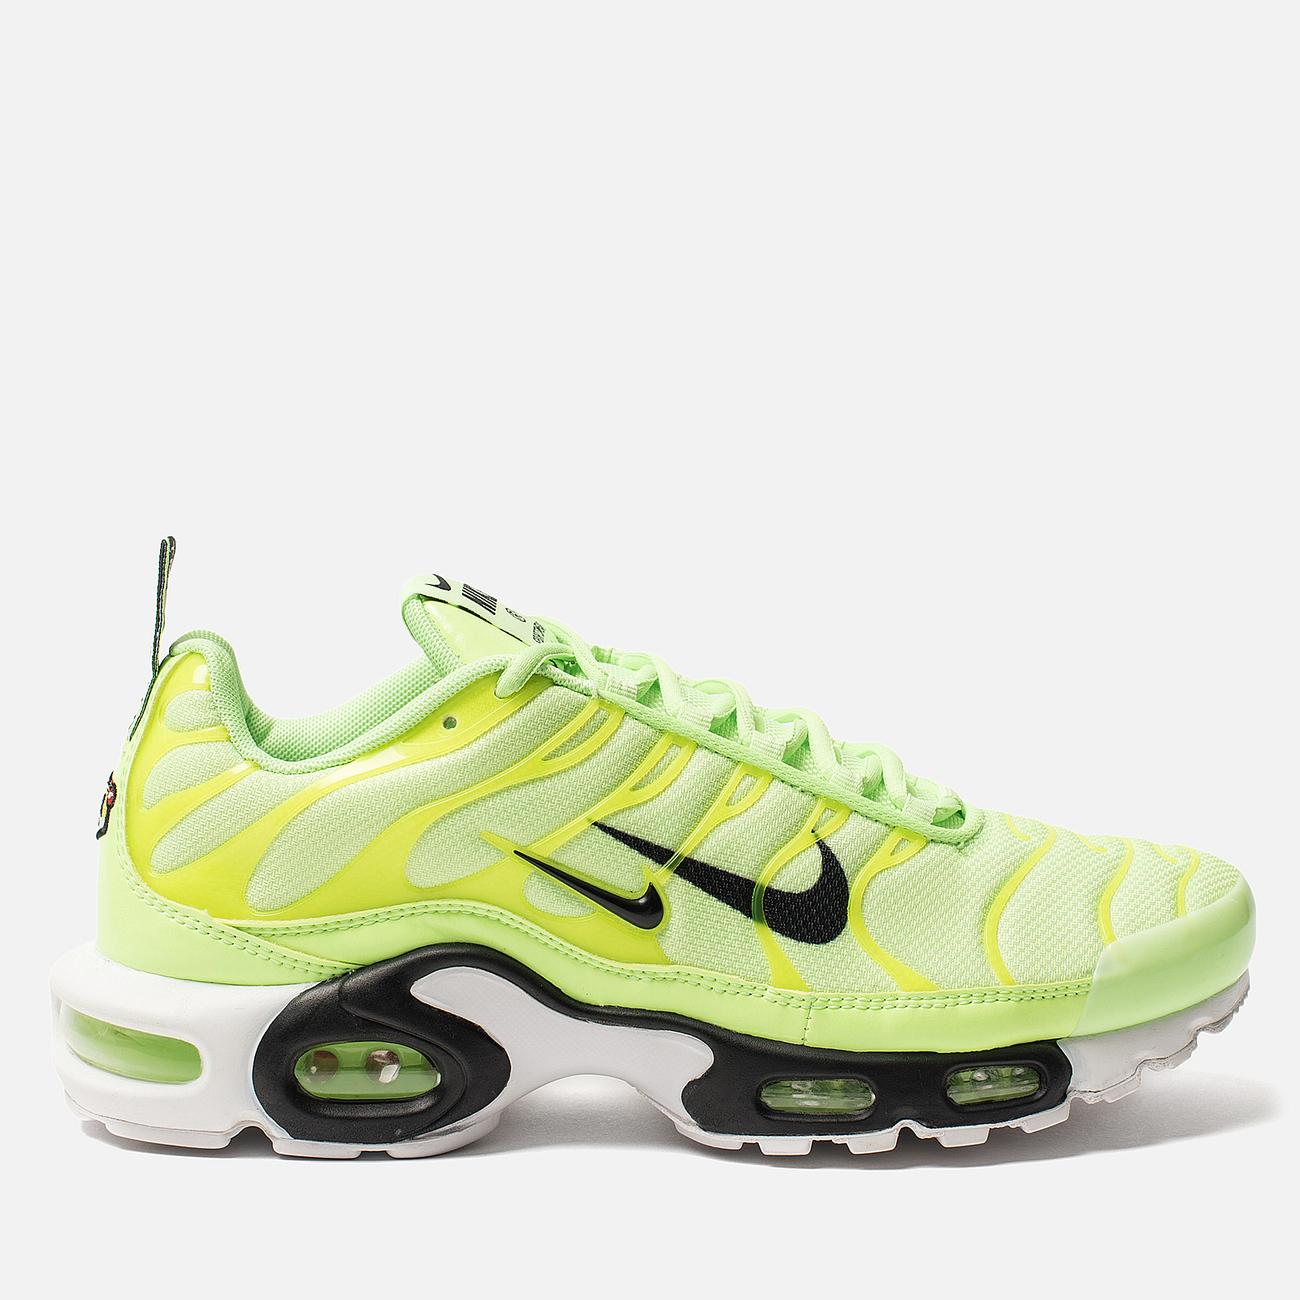 Мужские кроссовки Nike Air Max Plus PRM Lime Blast/Black/White